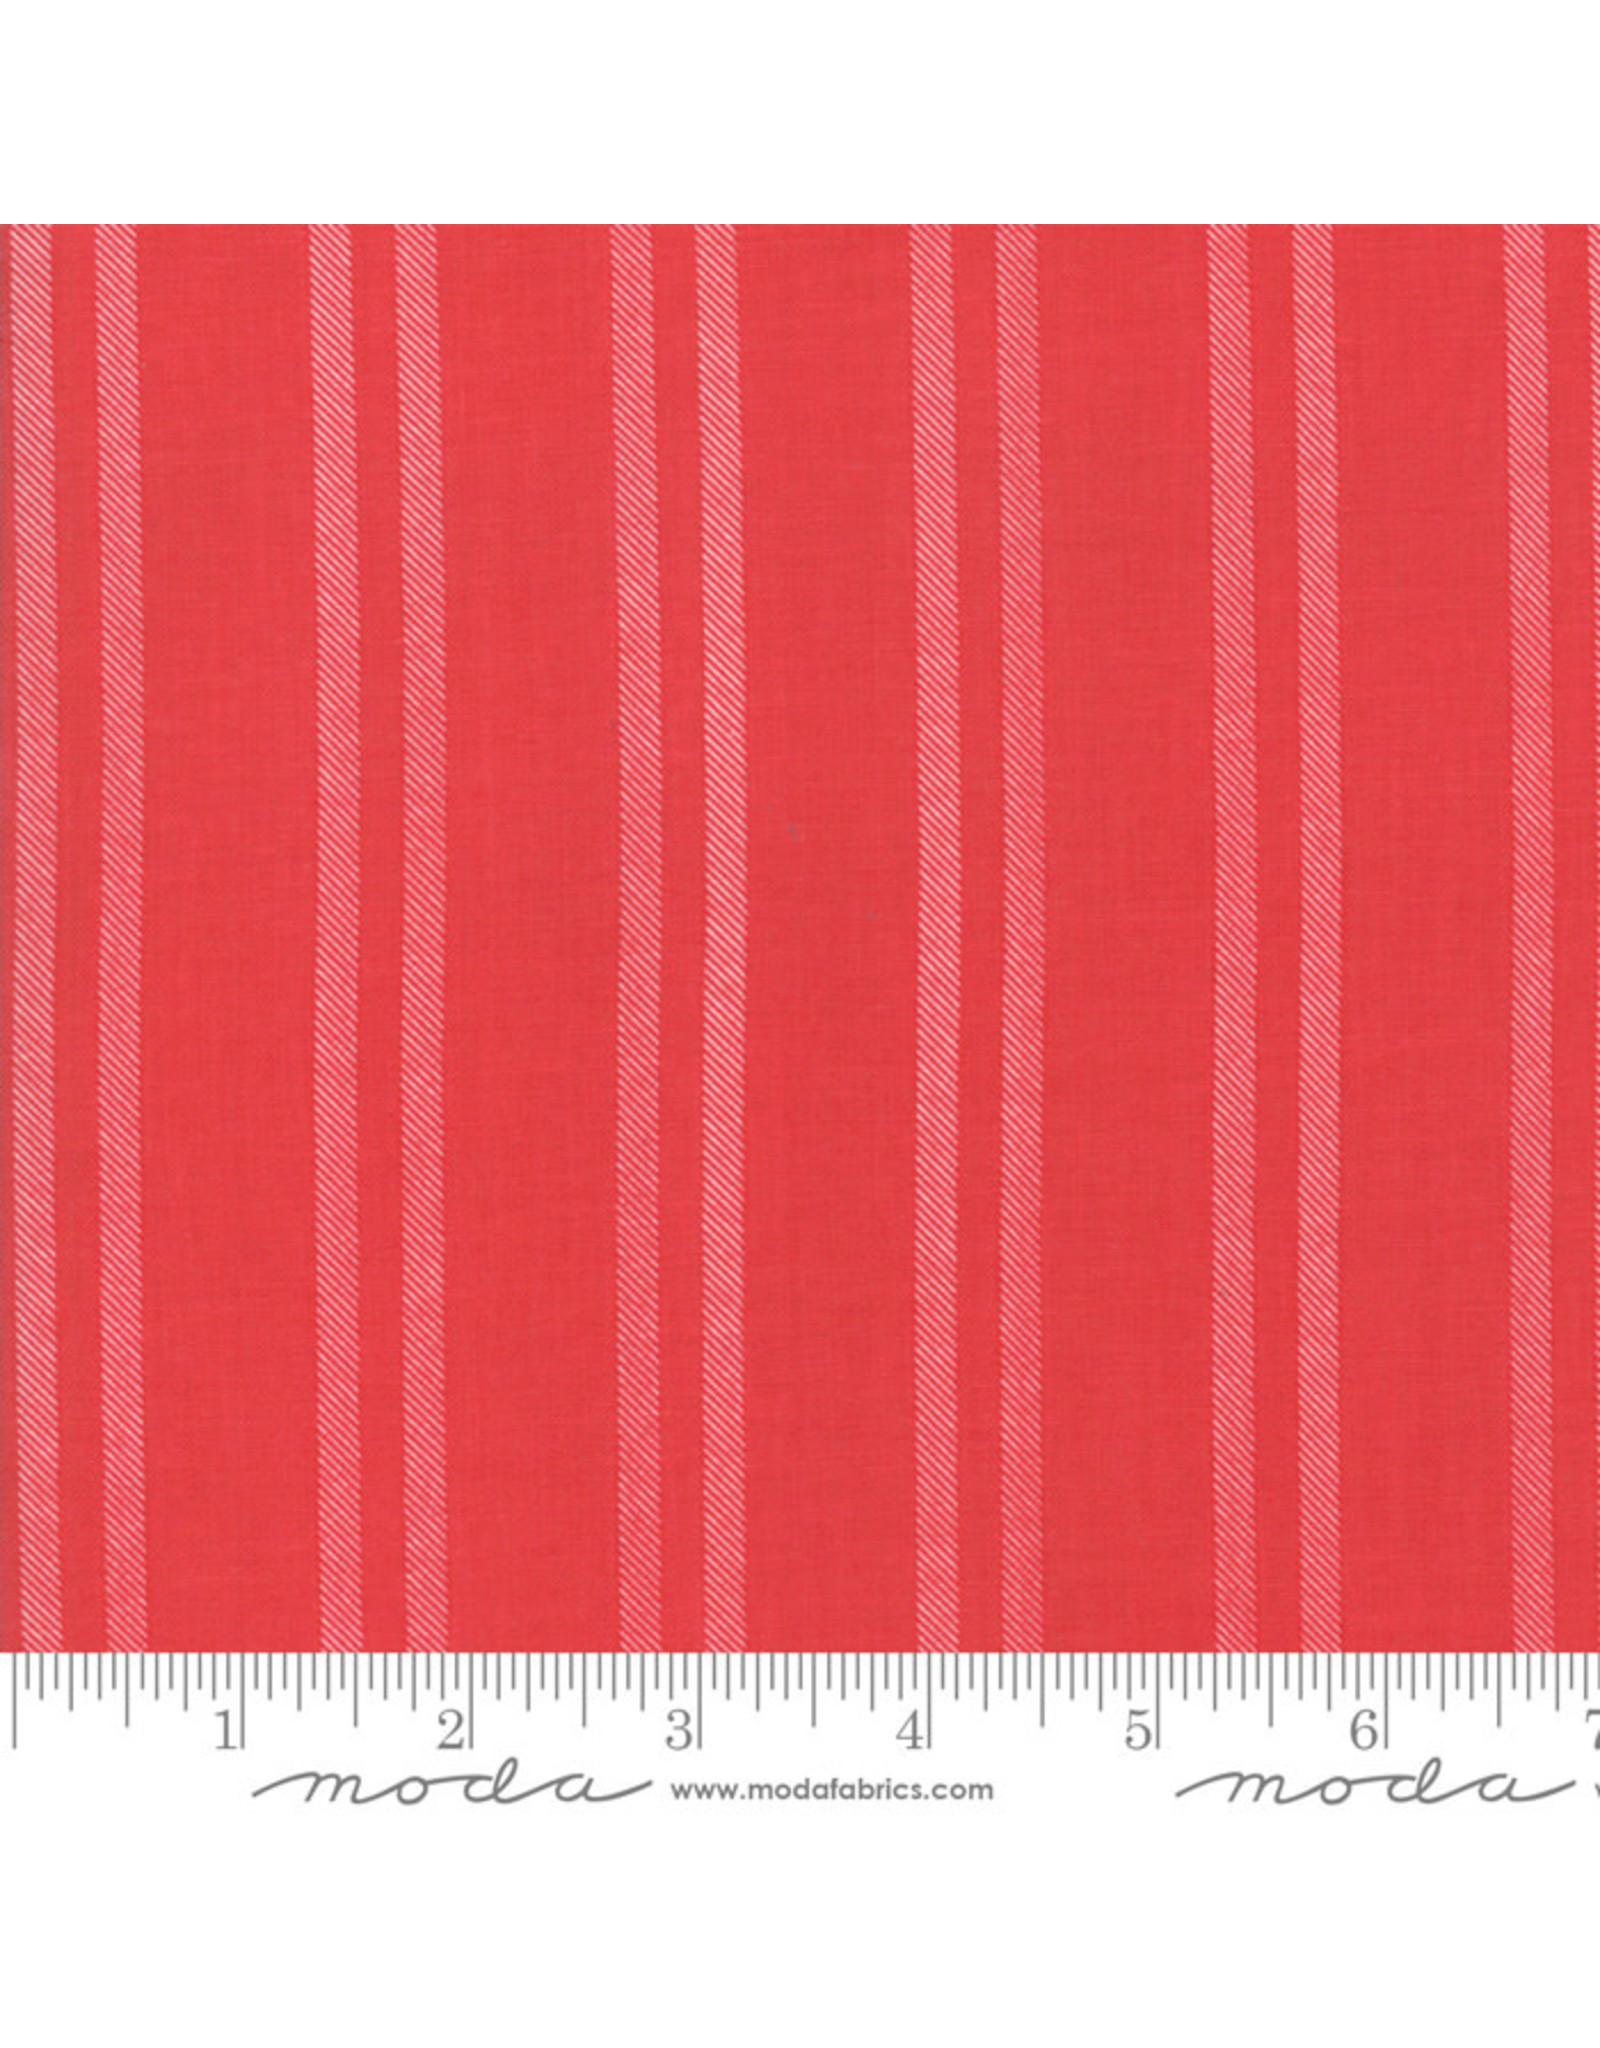 Moda Little Tree - Farmhouse Stripe Red